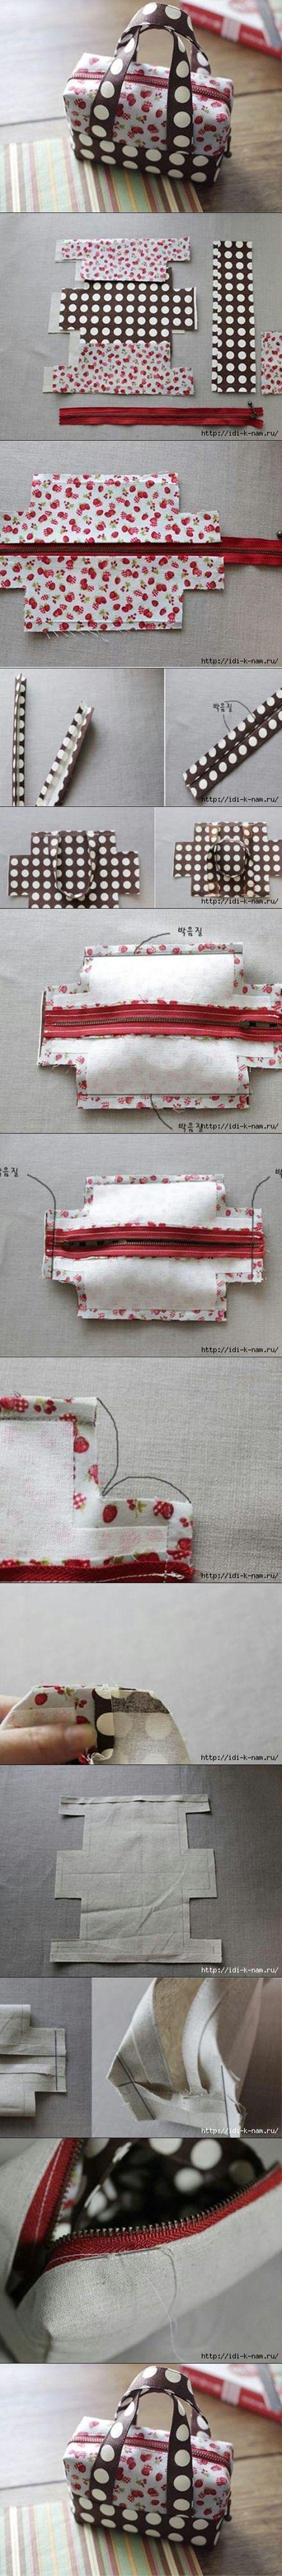 The Perfect DIY Cute Mini Fabric Tote - http://theperfectdiy.com/the-perfect-diy-cute-mini-fabric-tote/ #DIY, #Giftidea